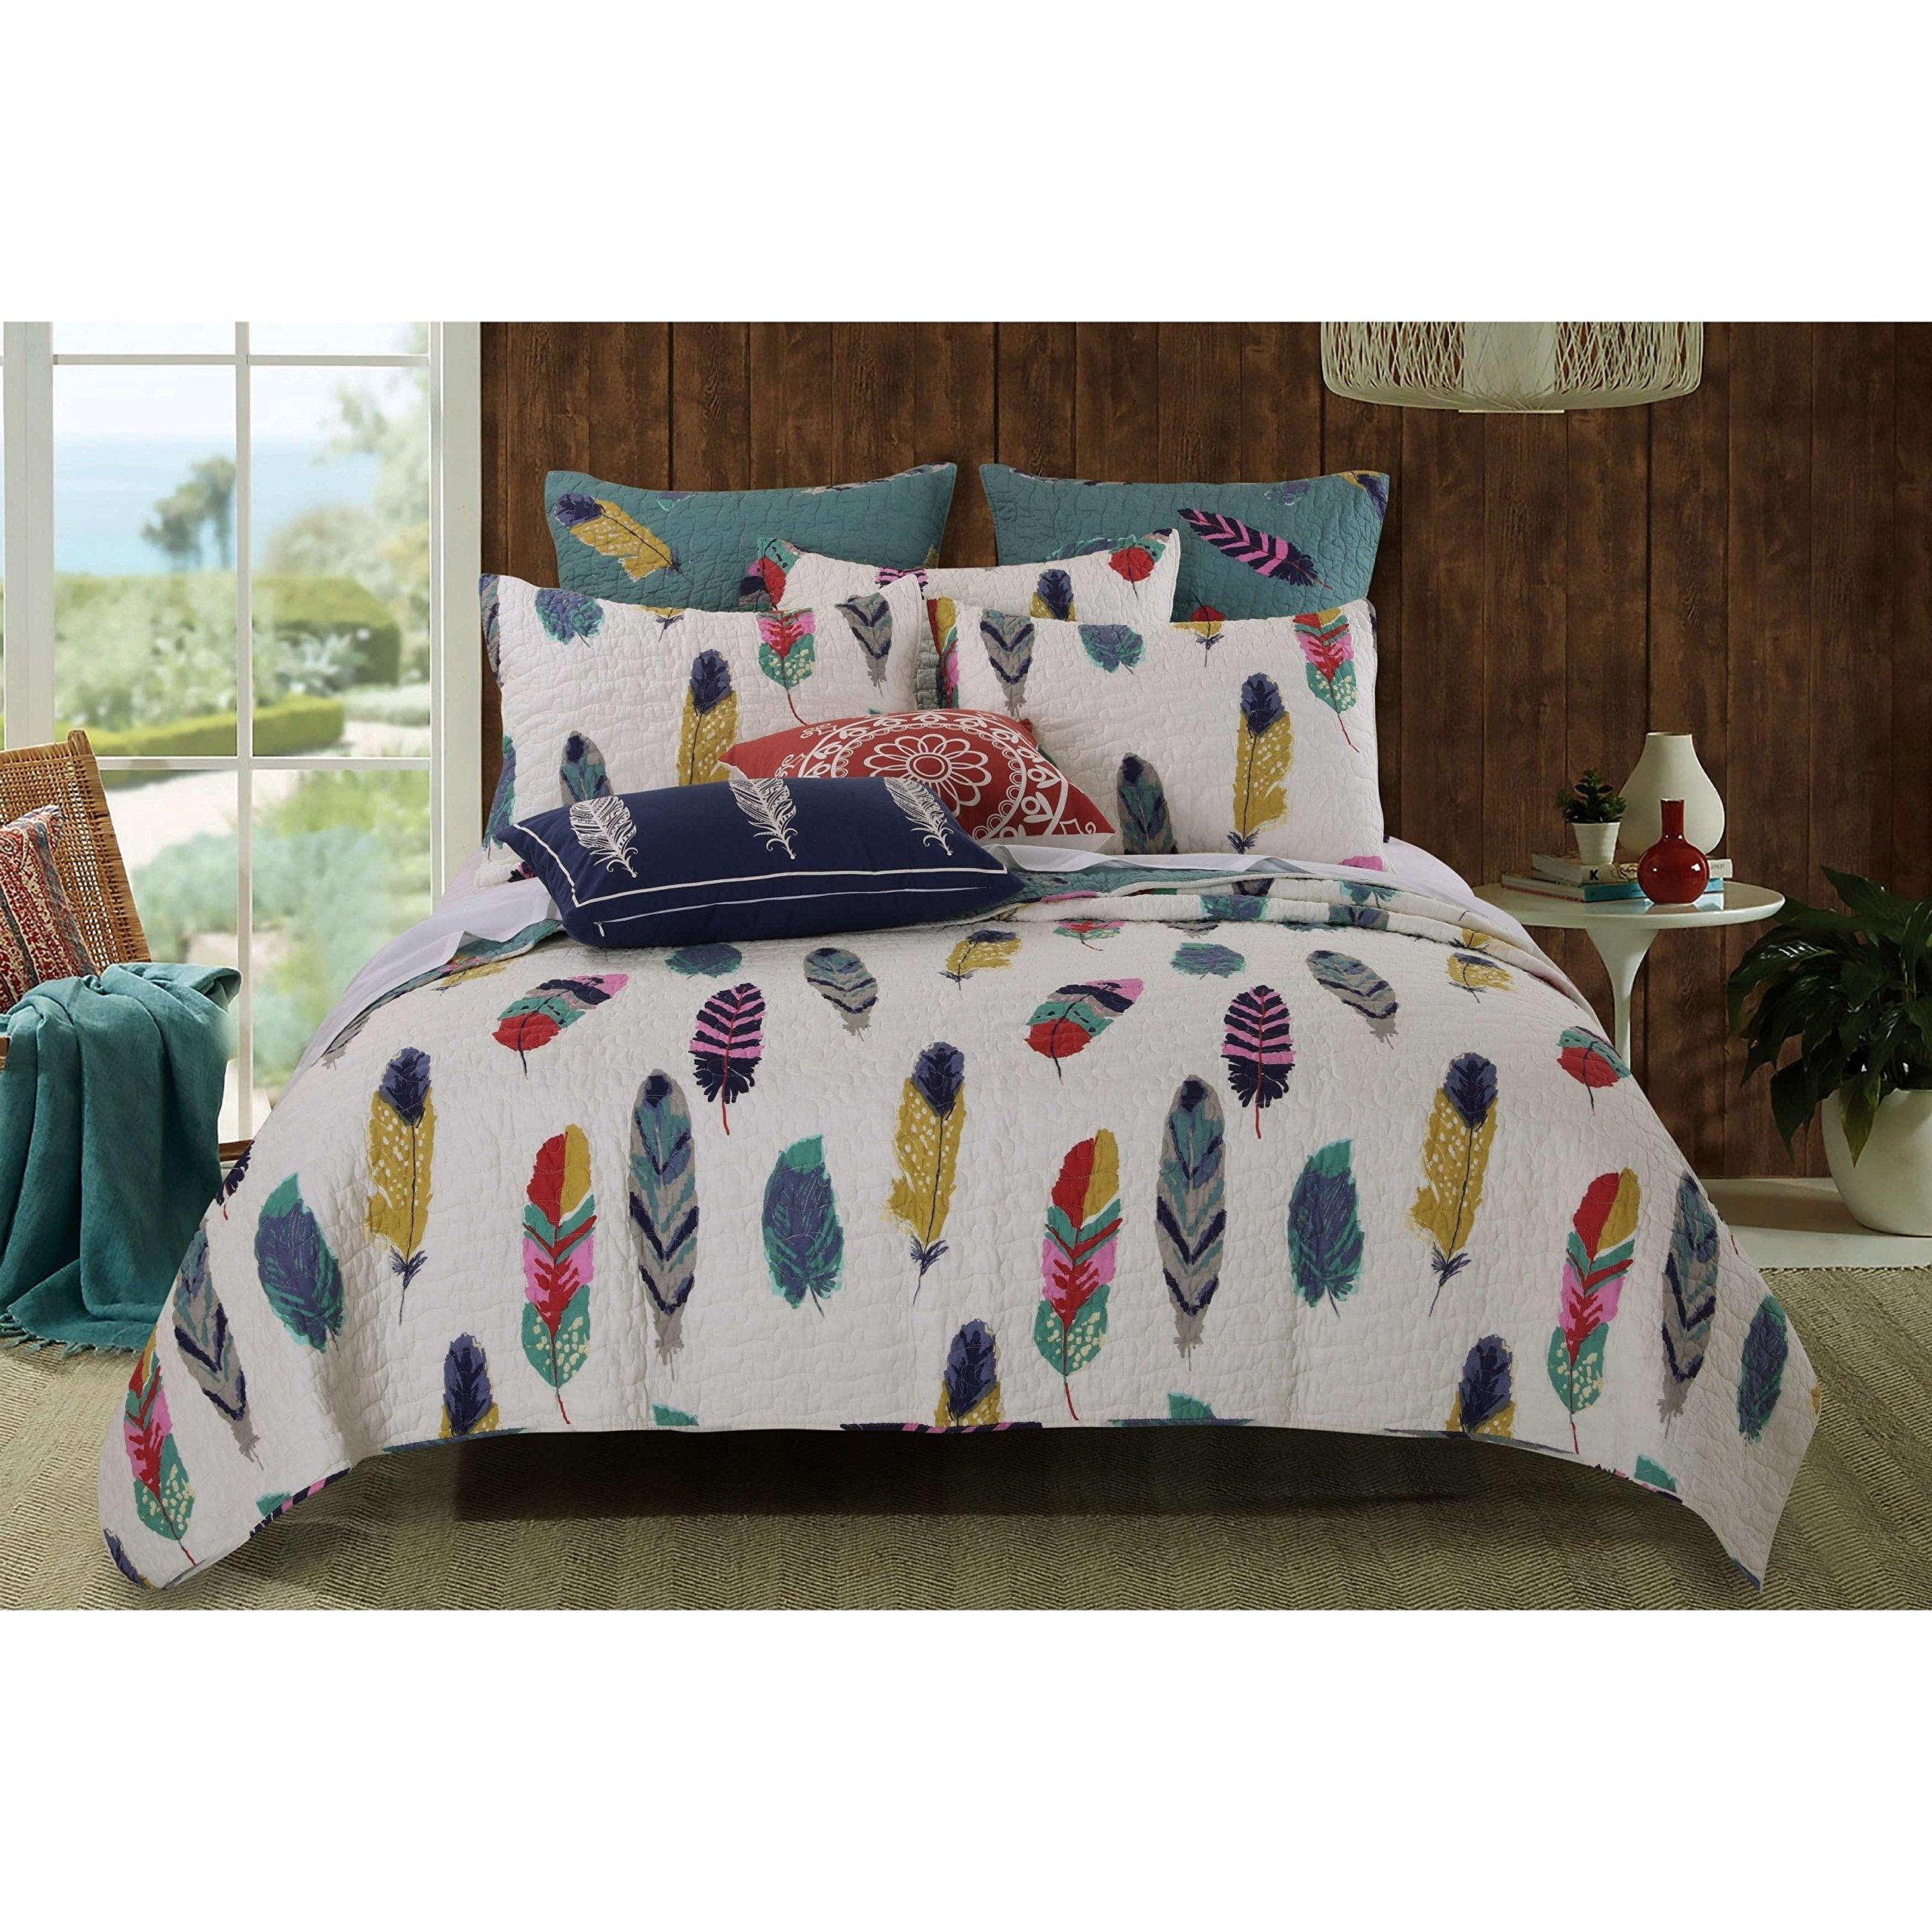 3 Piece Multi Colorful Bird Feathers Quilt Full Queen Set, Elegant Dream Catcher Design, Blue Animal Motif Print Reverse Bedding, Hippy Indie Boho Chic Style, Natural Splash Colors, Cotton, Polyester